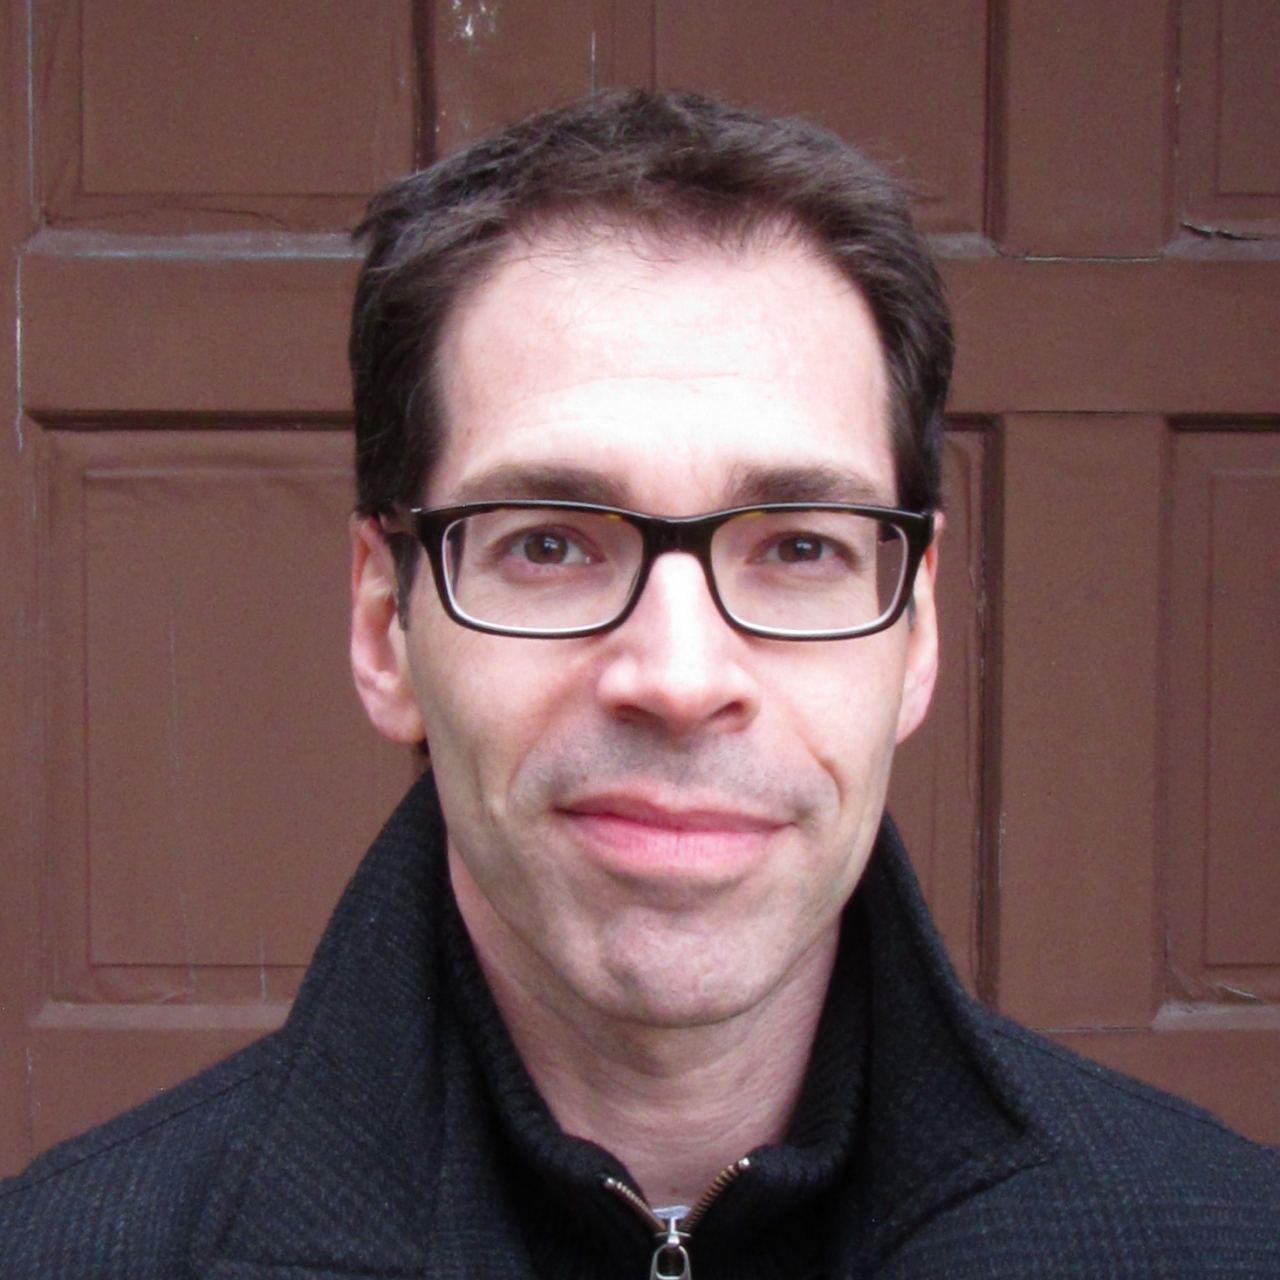 Phillip Haid